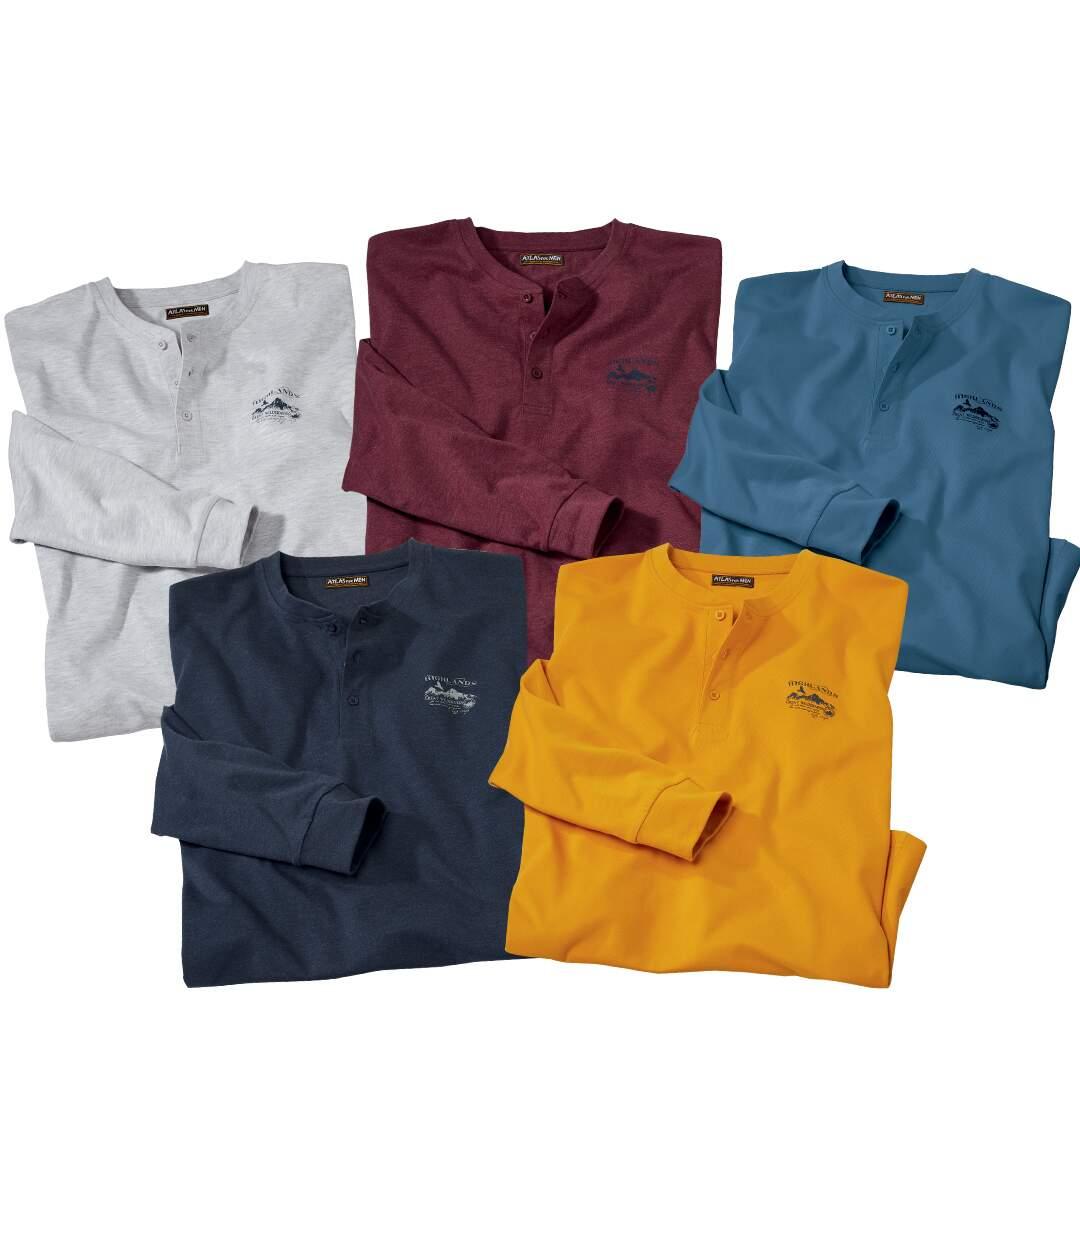 Pack of 5 Men's Long Sleeve Essential Tops Atlas For Men